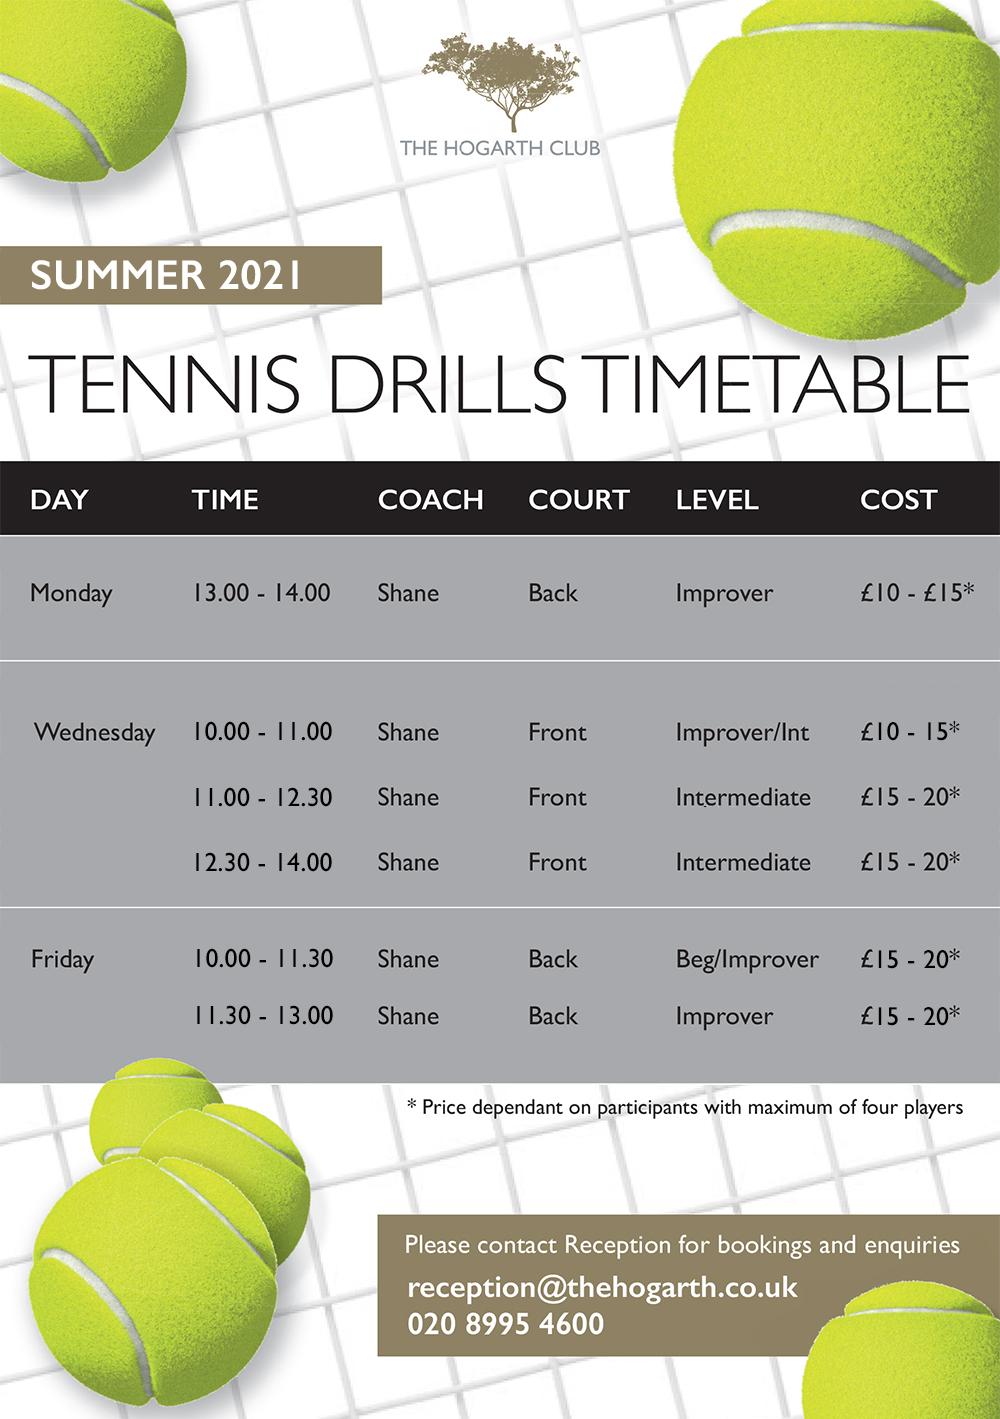 Hogarth club summer tennis drills timetable